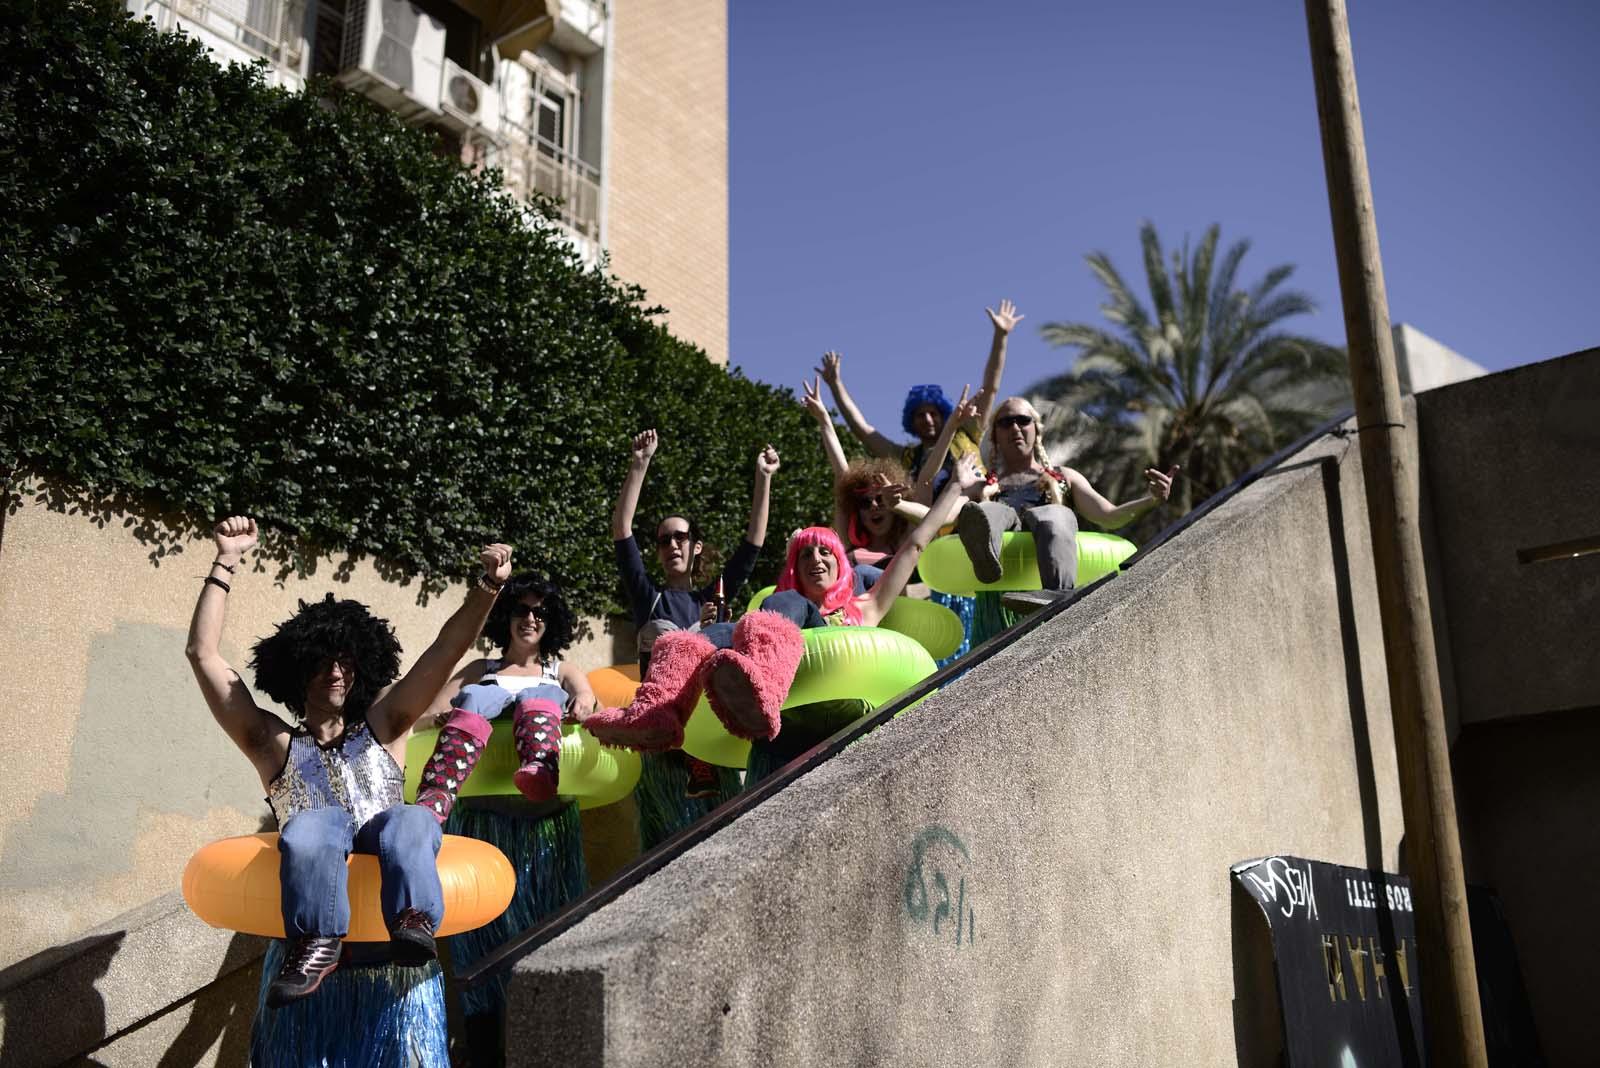 Purim in Tel Aviv. Photo by Tomer Neuberg/FLASH90